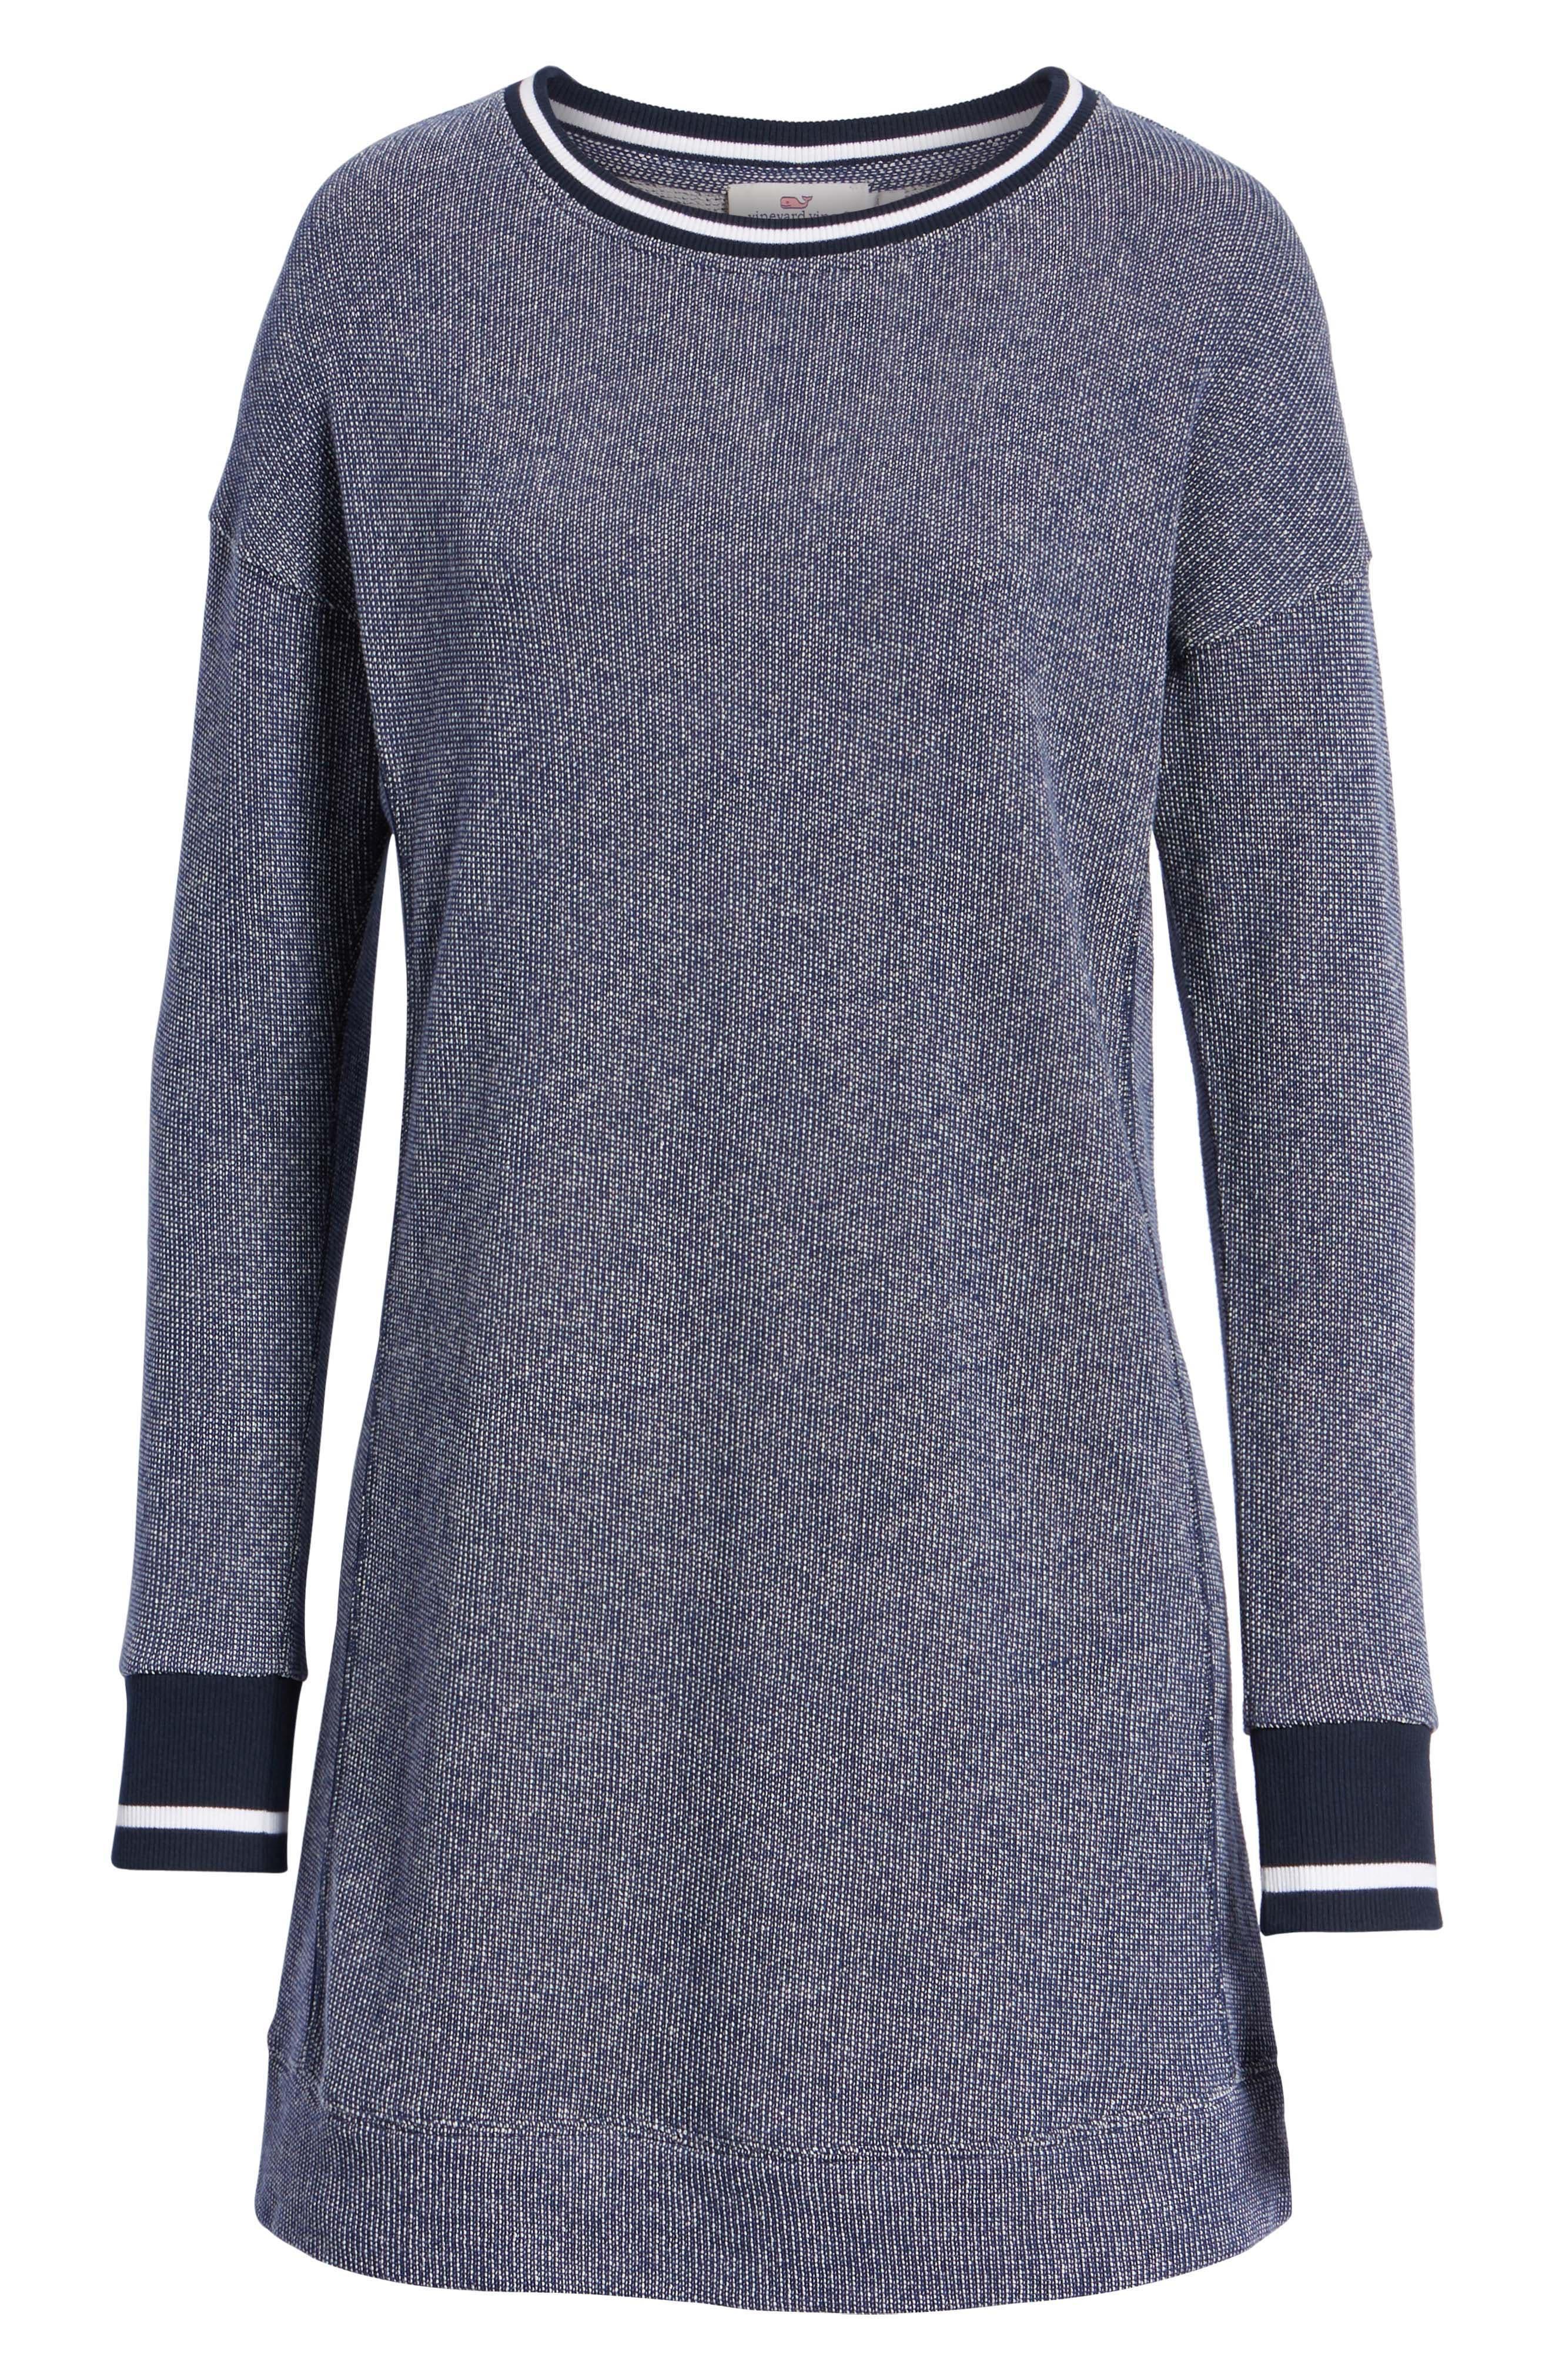 Sweatshirt Dress,                             Alternate thumbnail 7, color,                             476